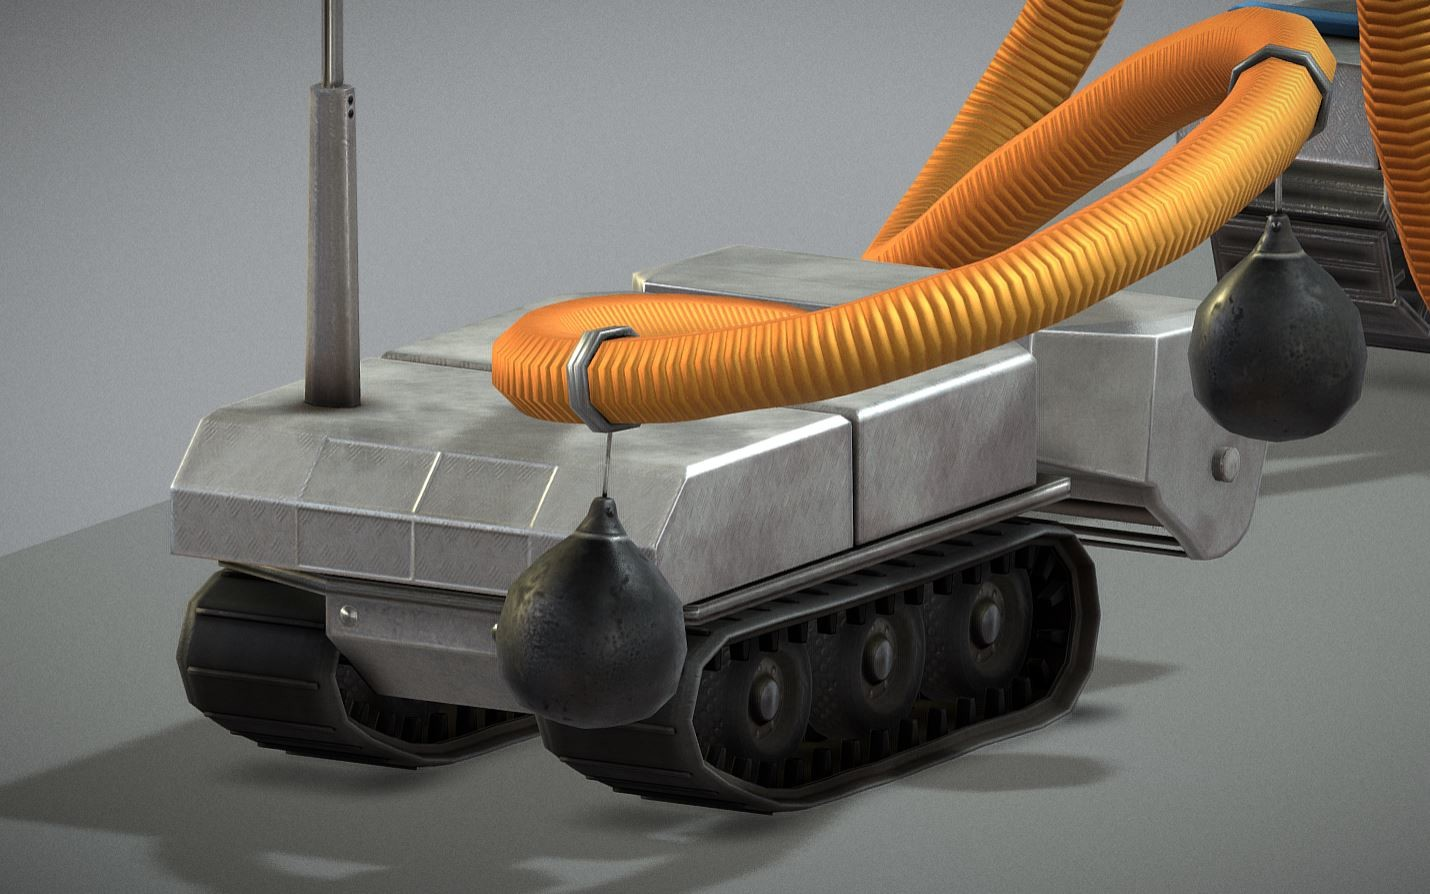 Desludging robot